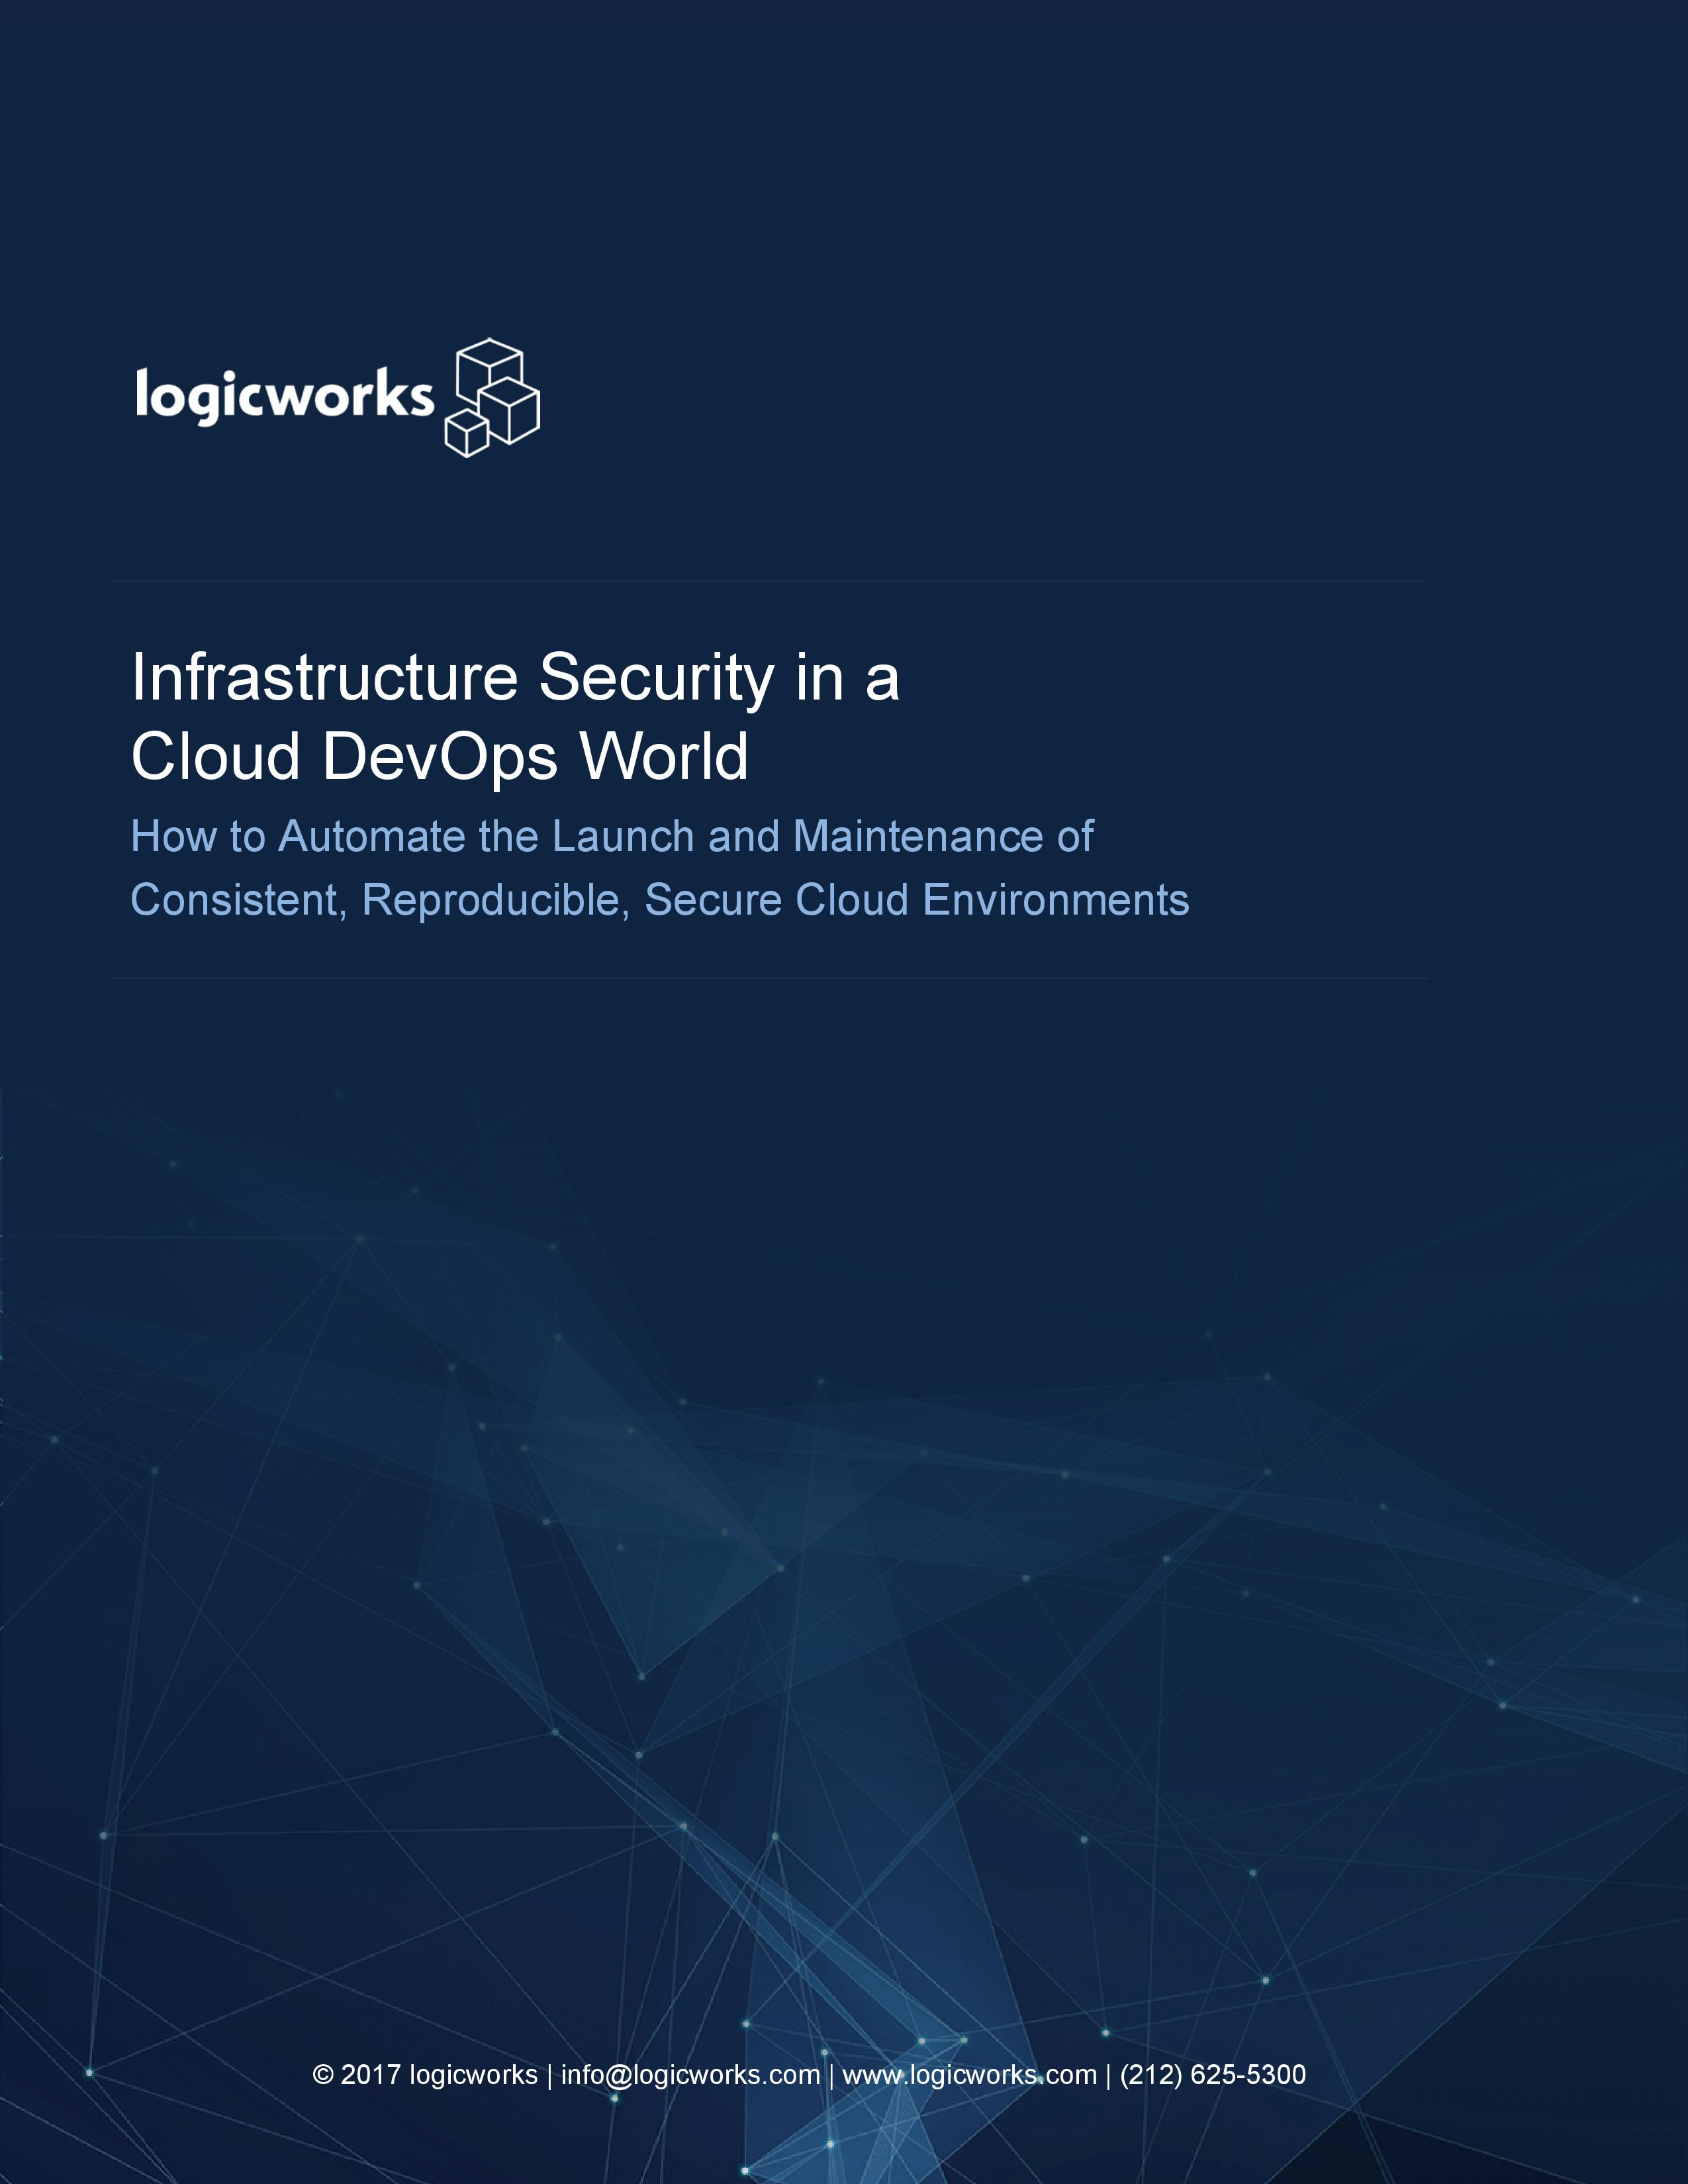 Infrastructure Security in a Cloud DevOps World.jpg